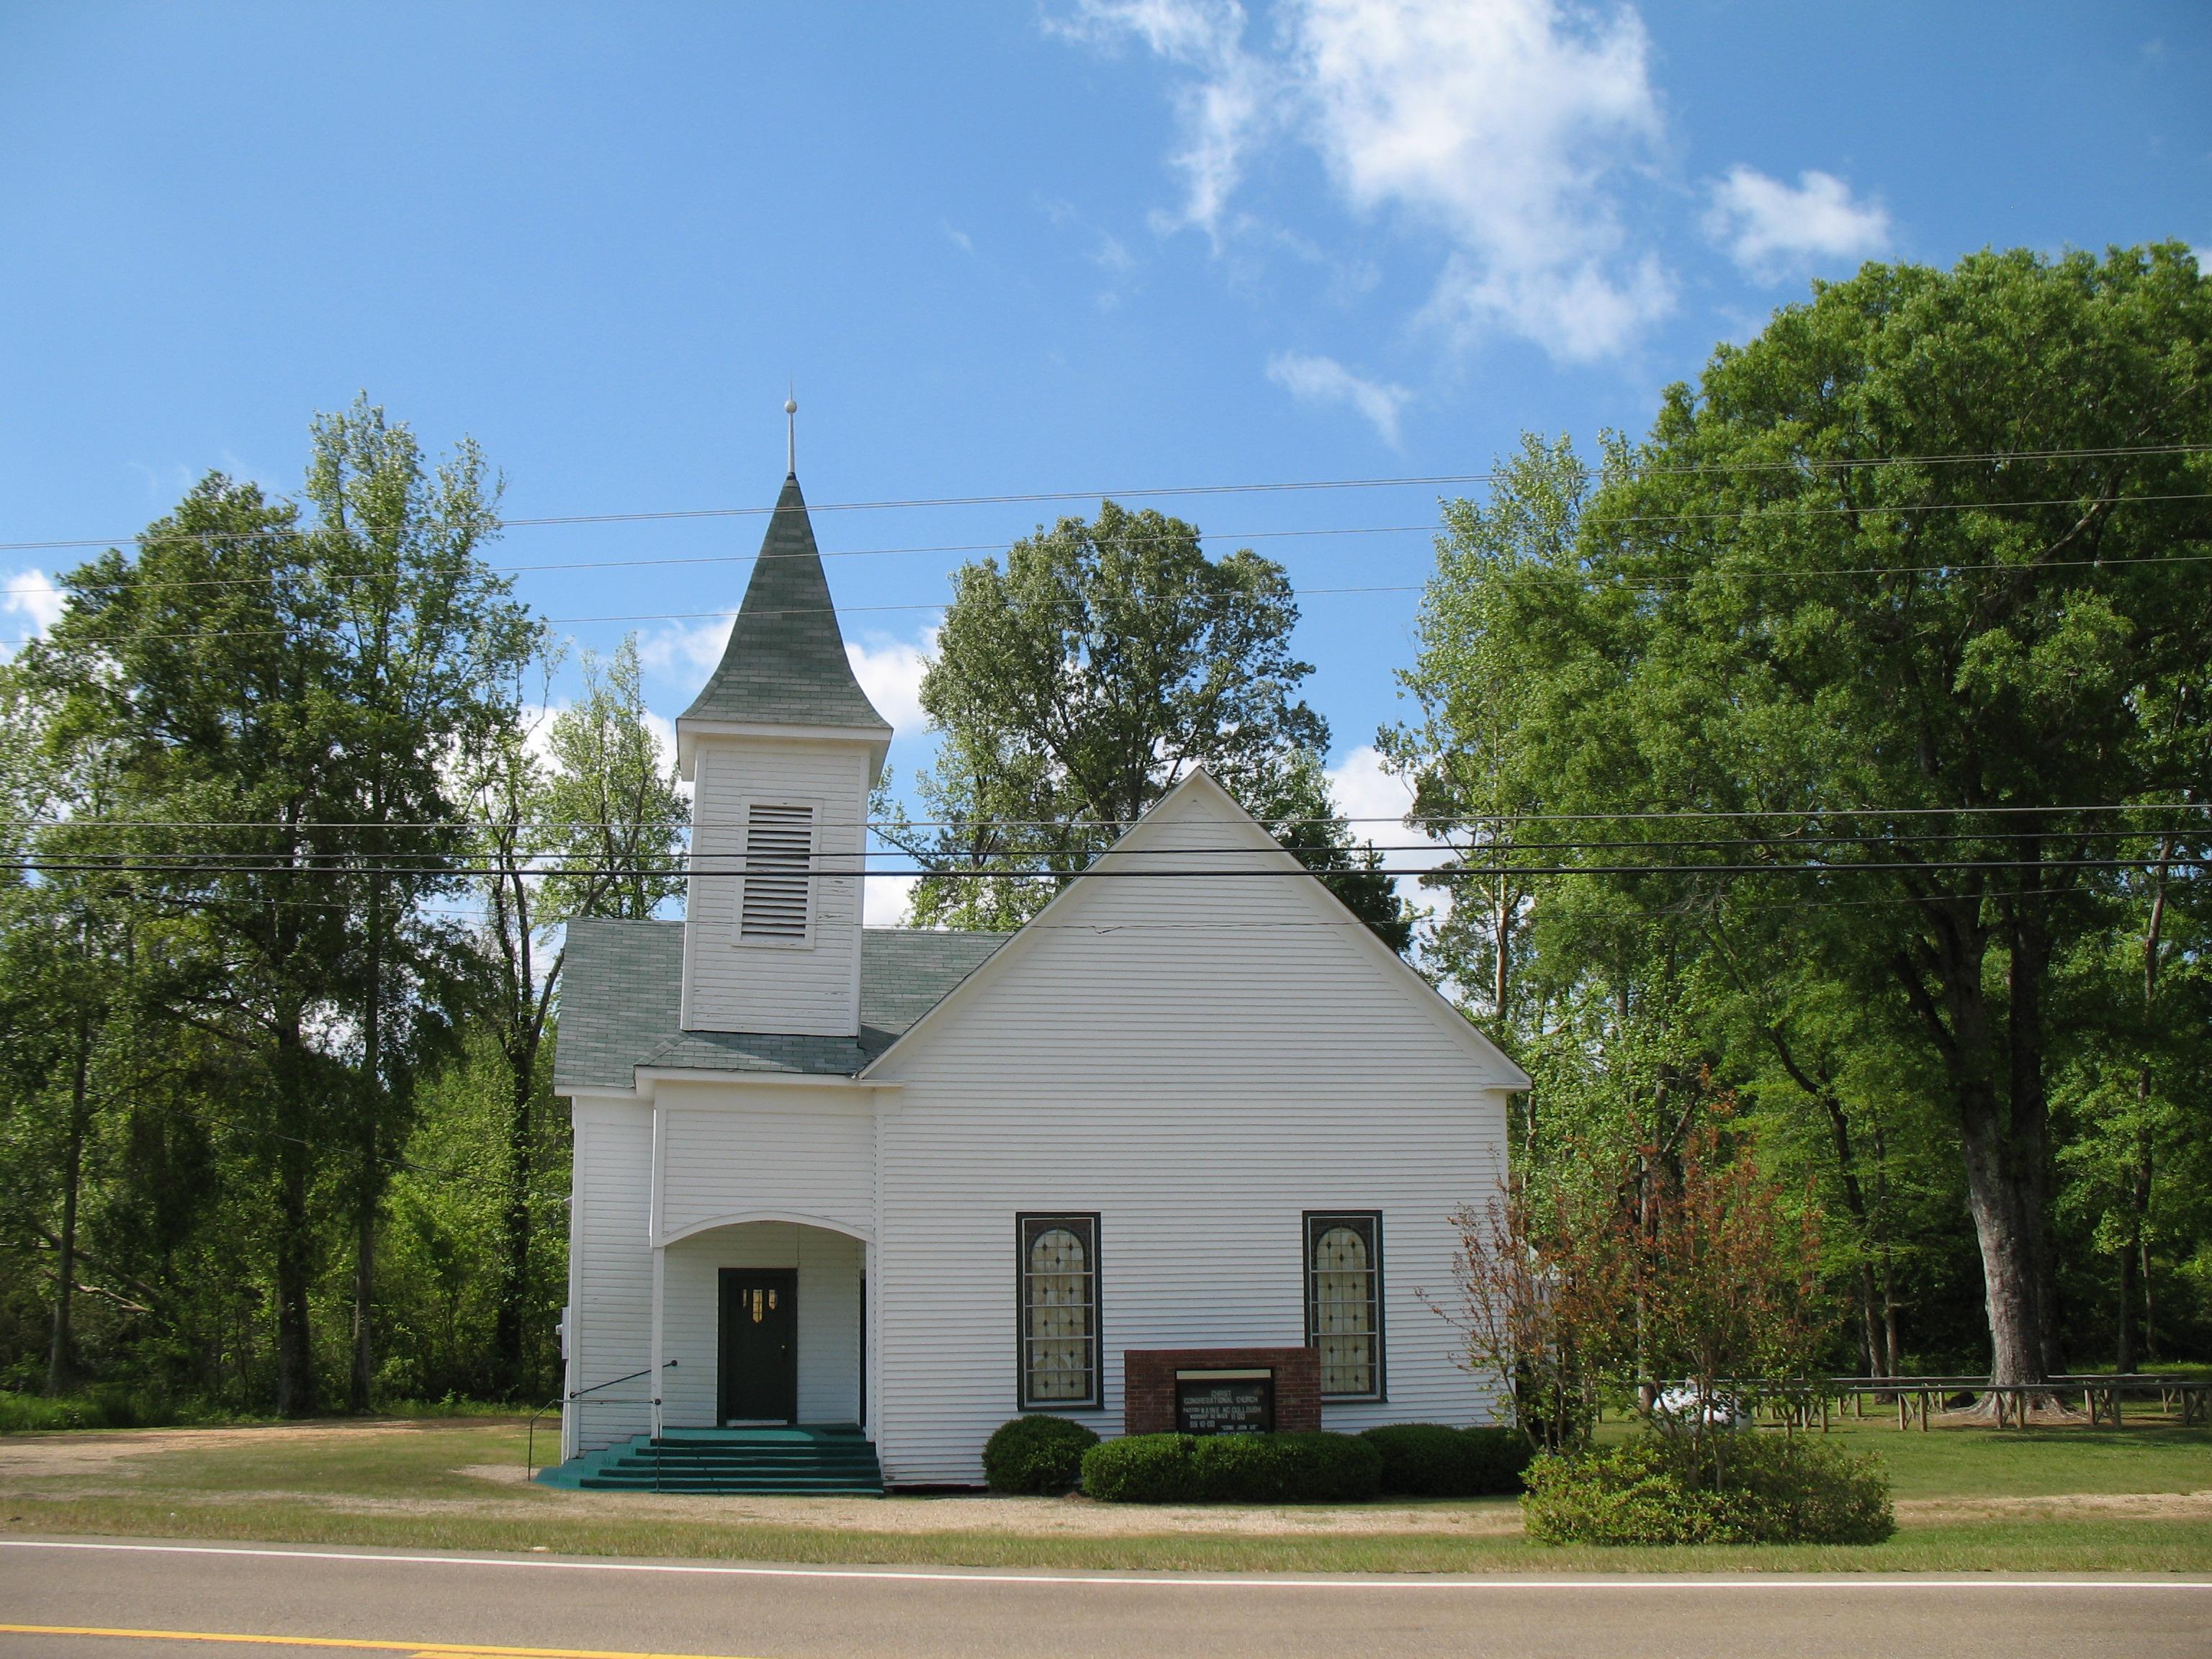 Mississippi rankin county sandhill - File Congregational Church Highway 18 Rankin County Mississippi Jpg